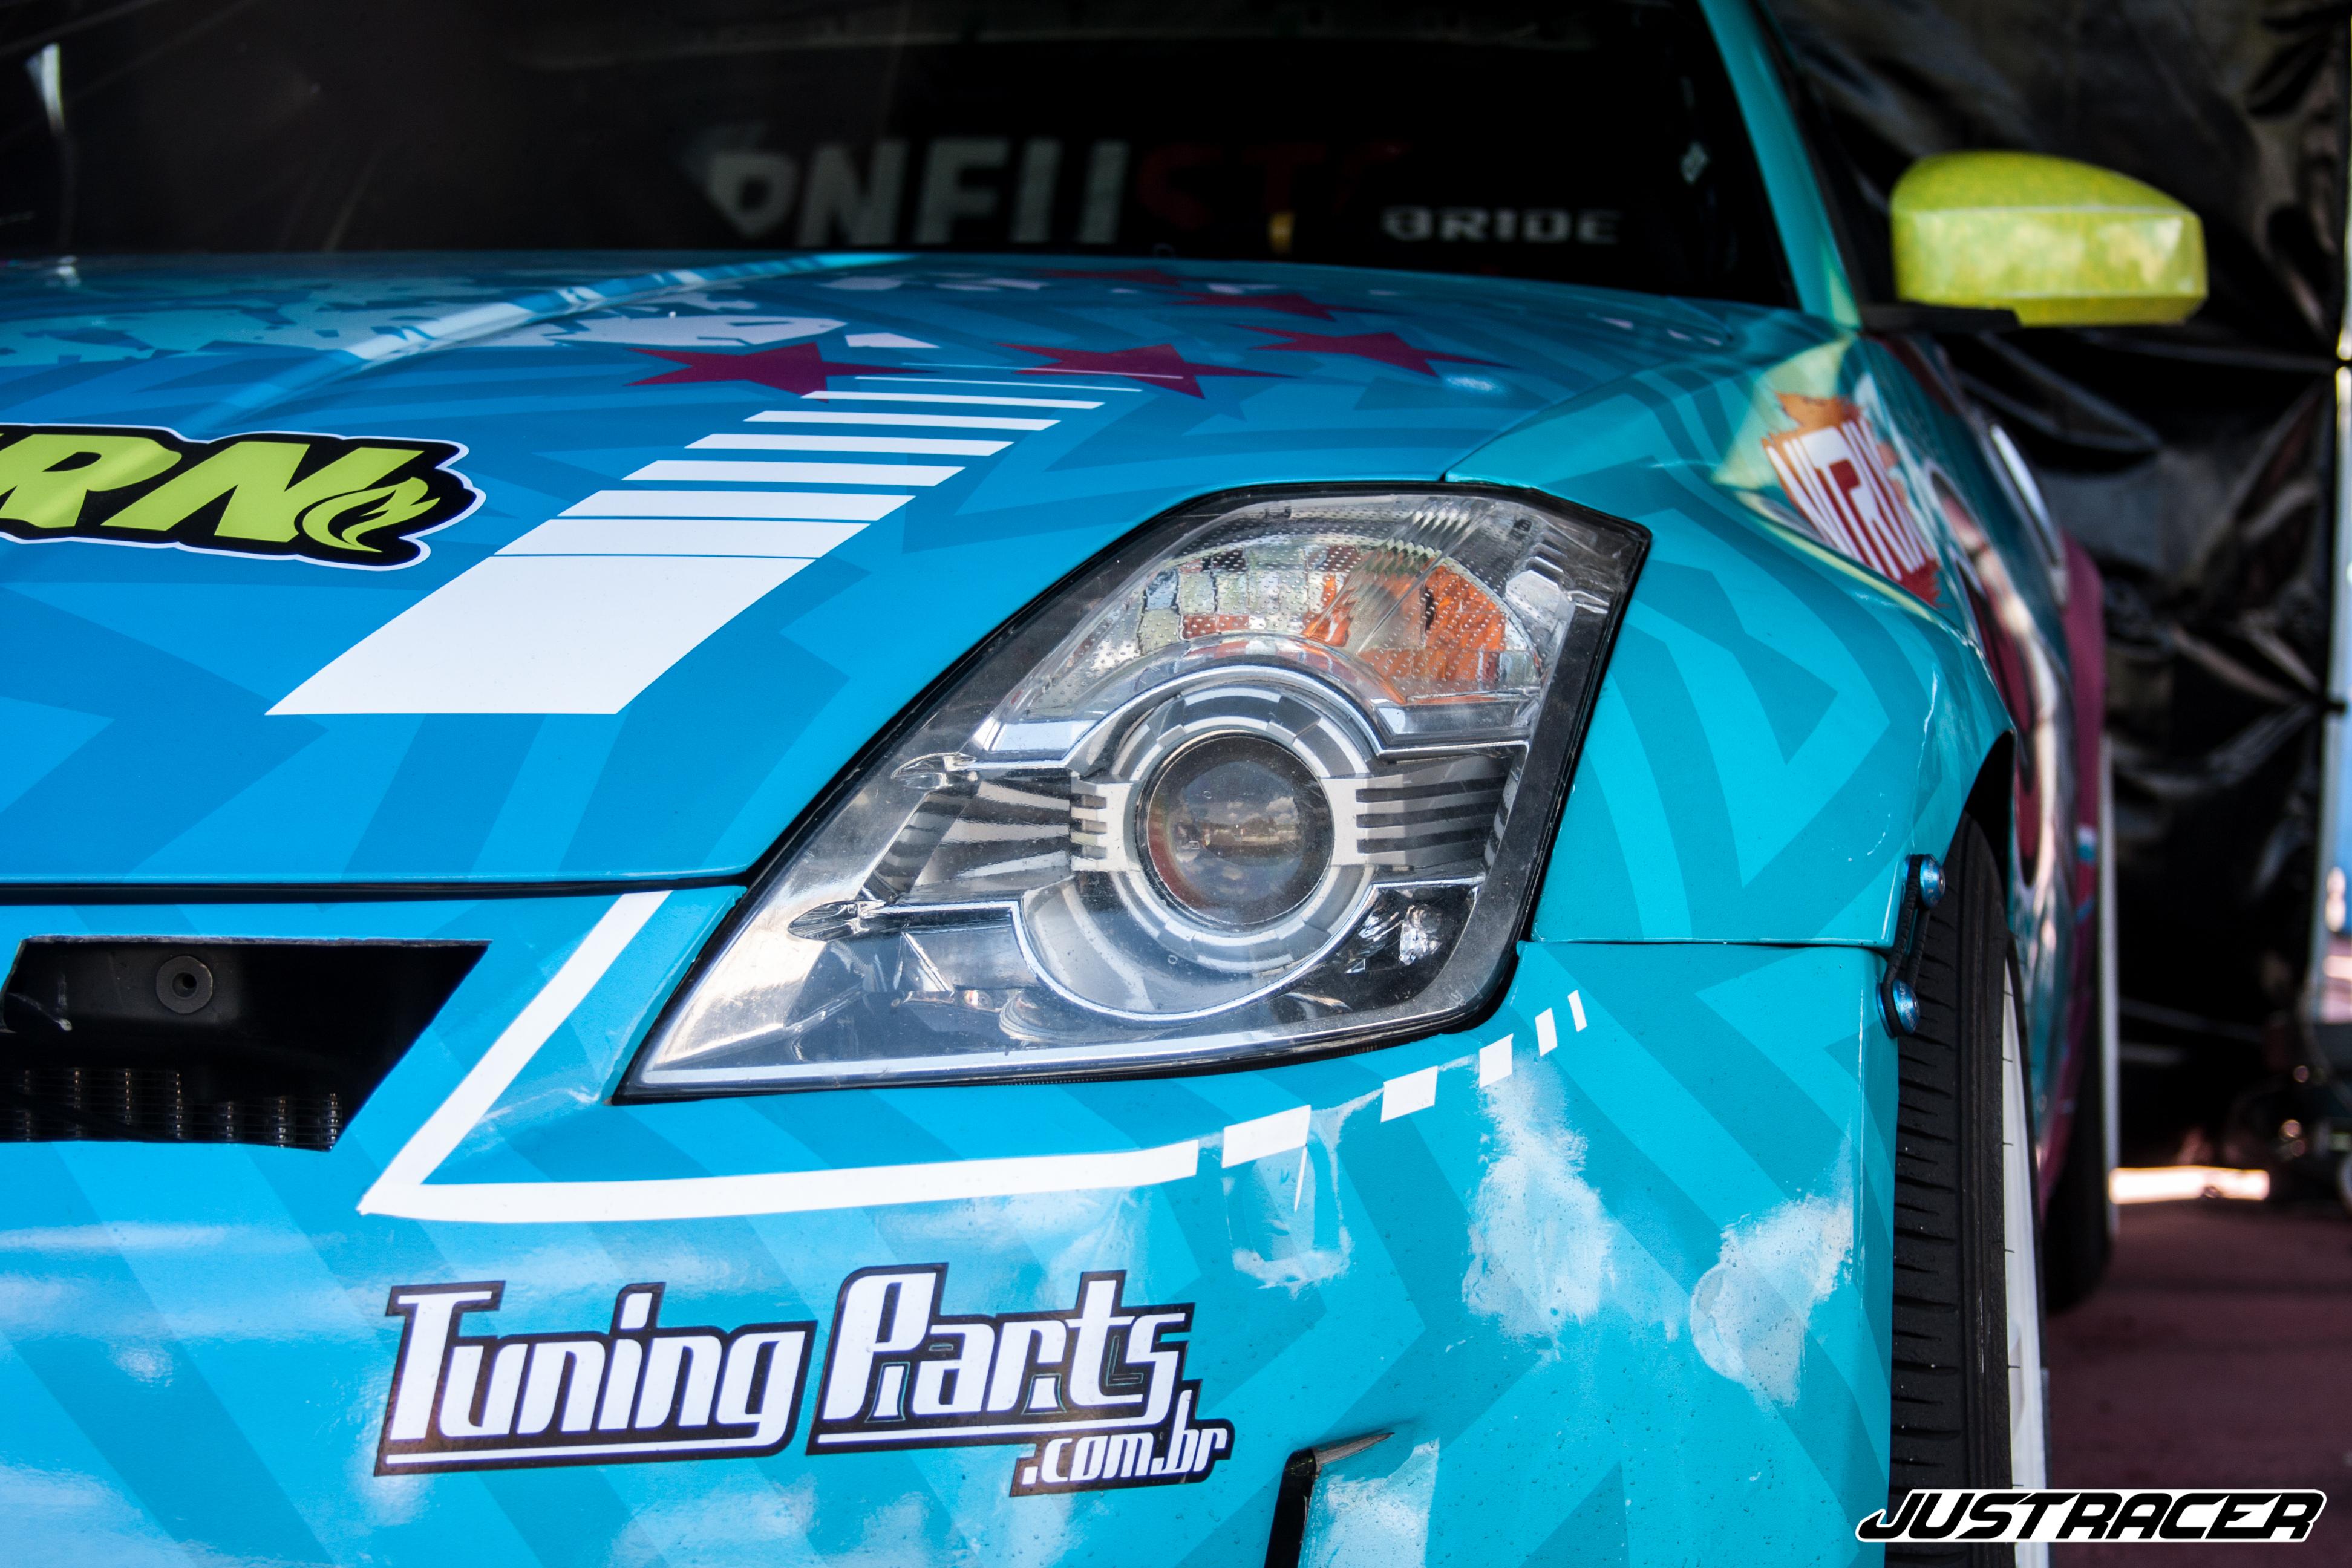 Foto: Just Racer